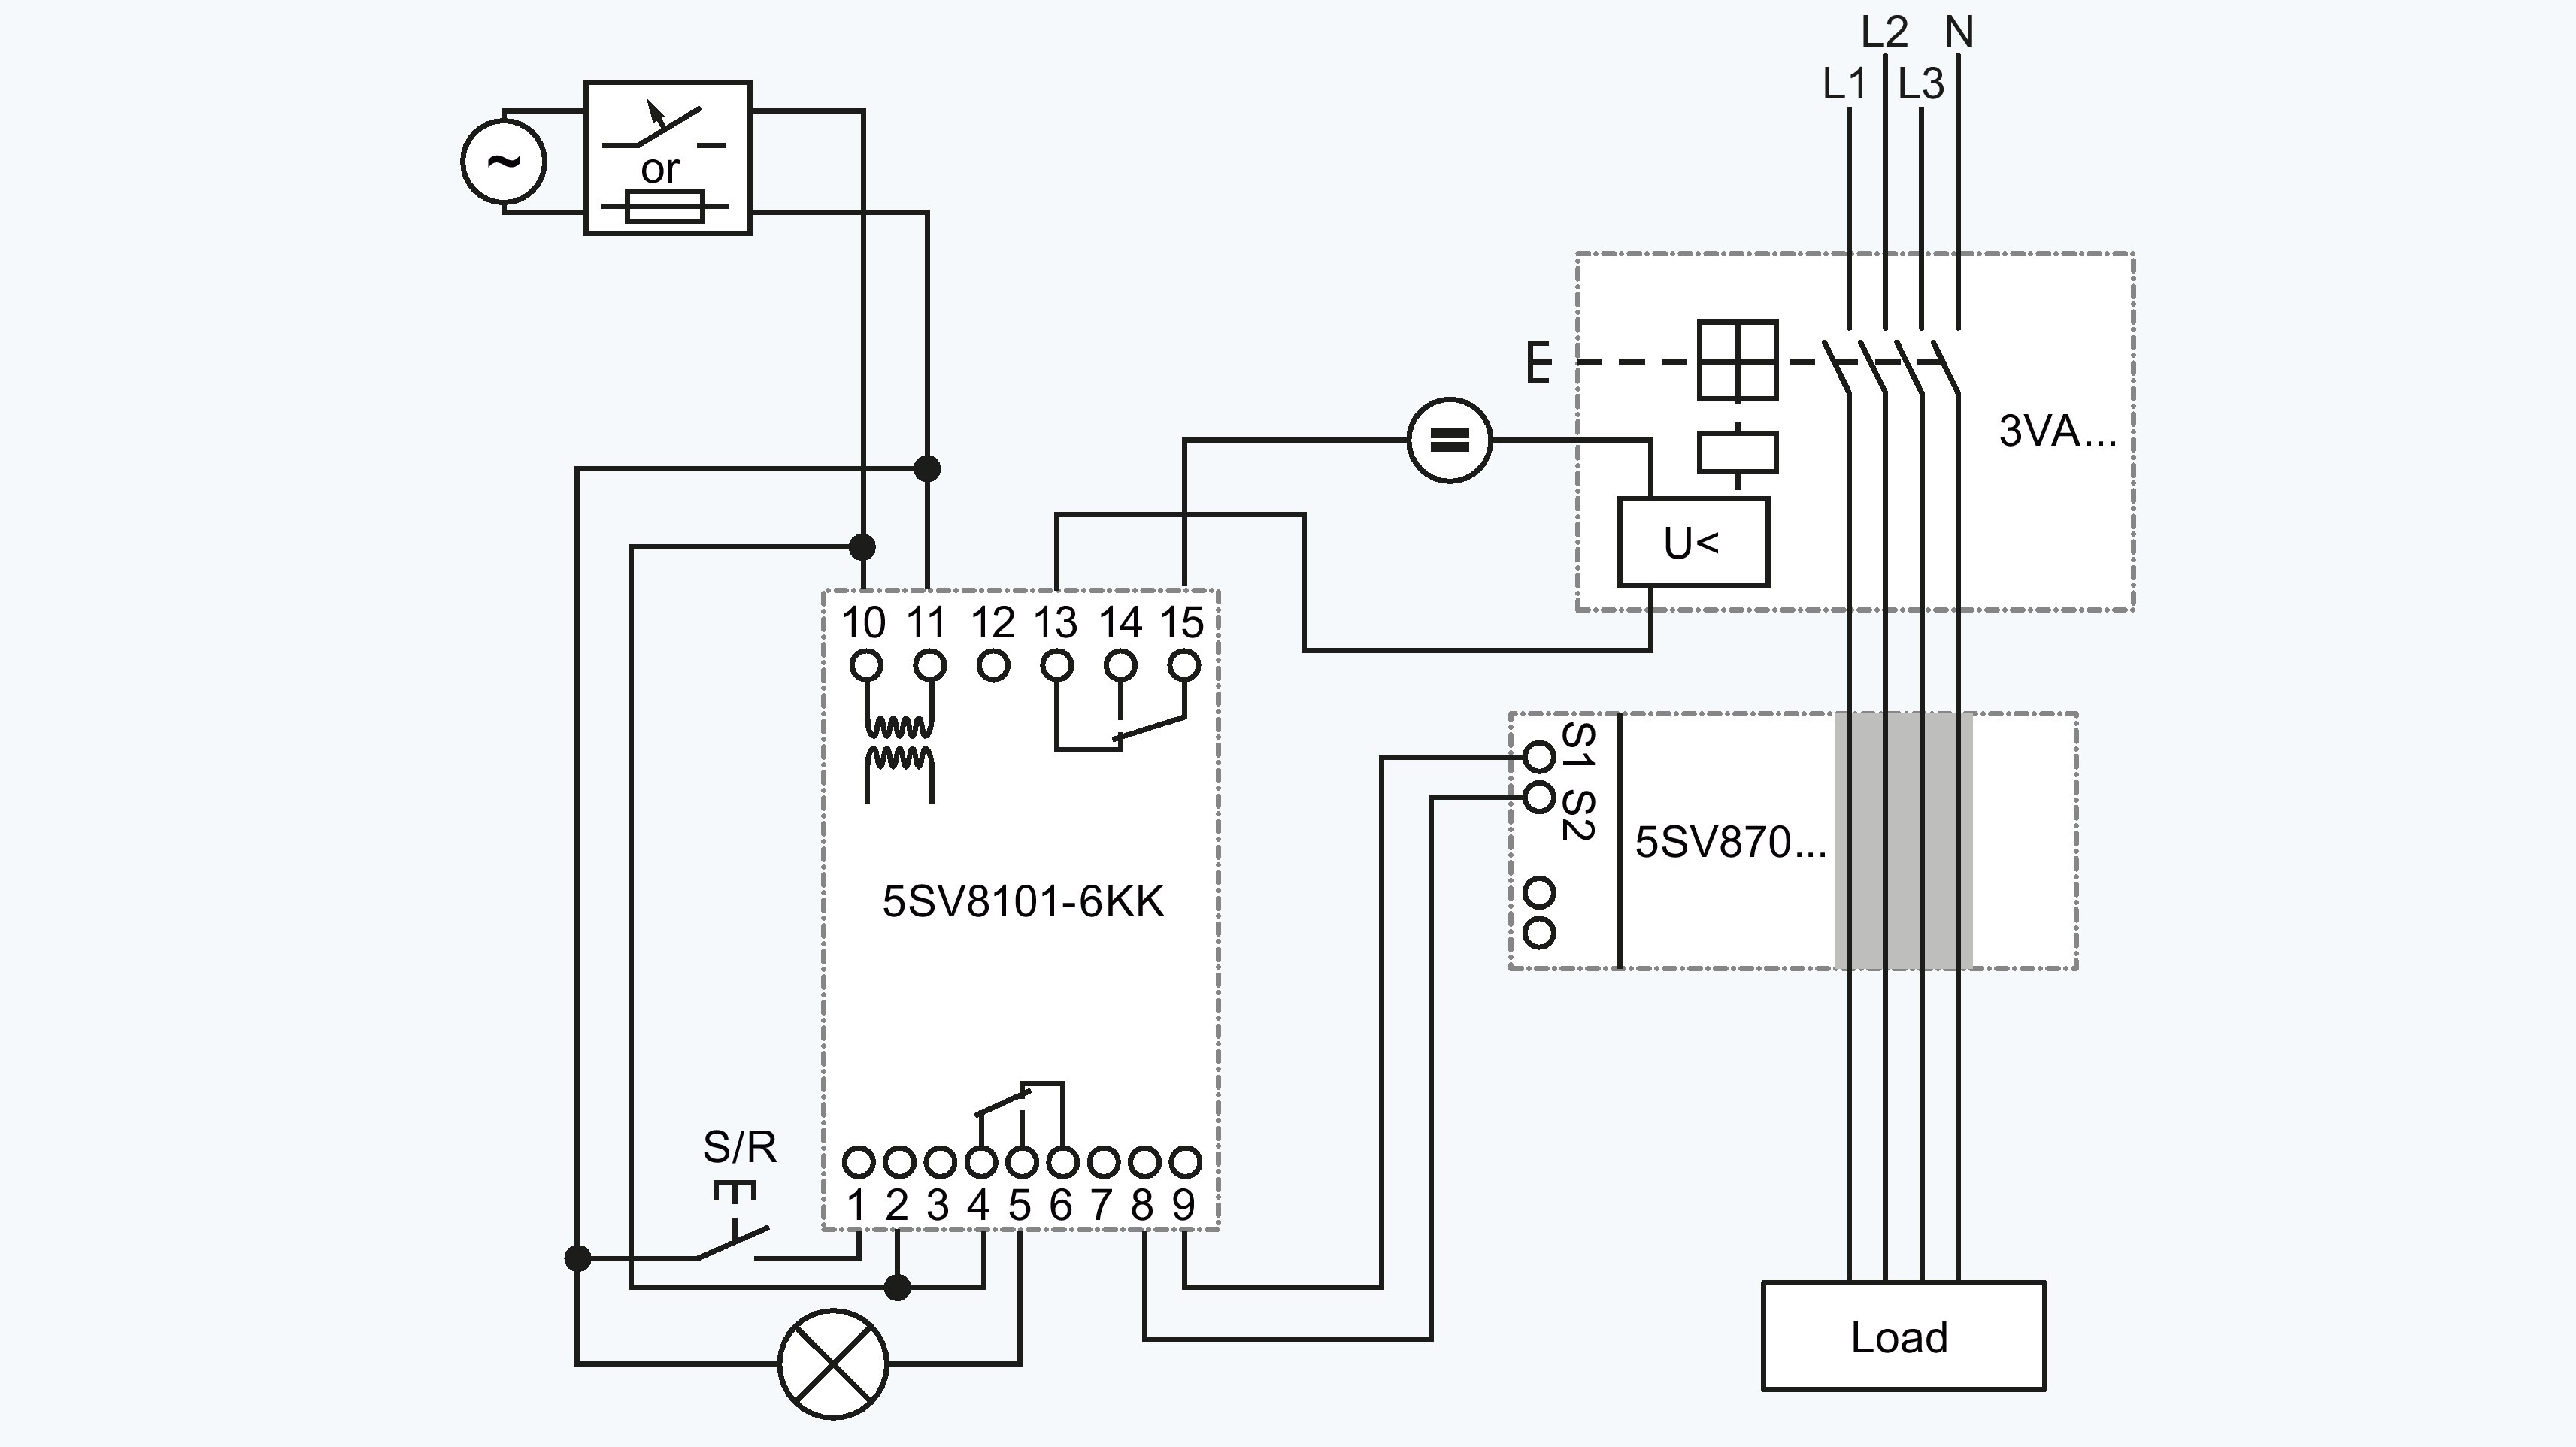 siemens shunt trip breaker wiring diagram square d shunt